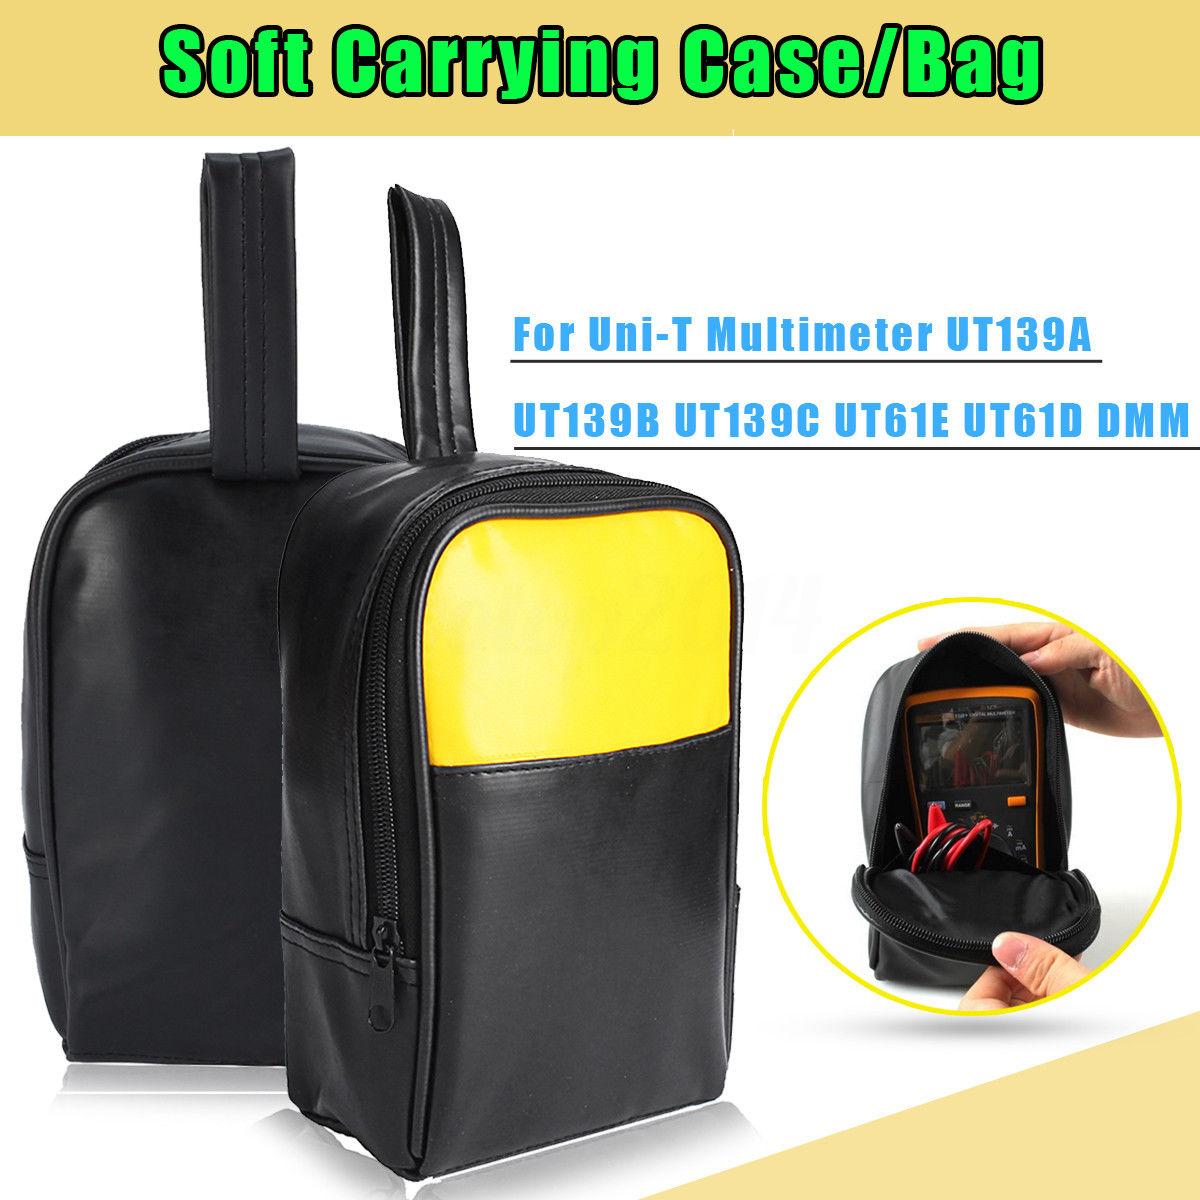 Doersupp Soft Carrying Bag For Uni-T Multimeter UT139A UT139B UT139C UT61E UT61D DMM PU Leather Waterproof